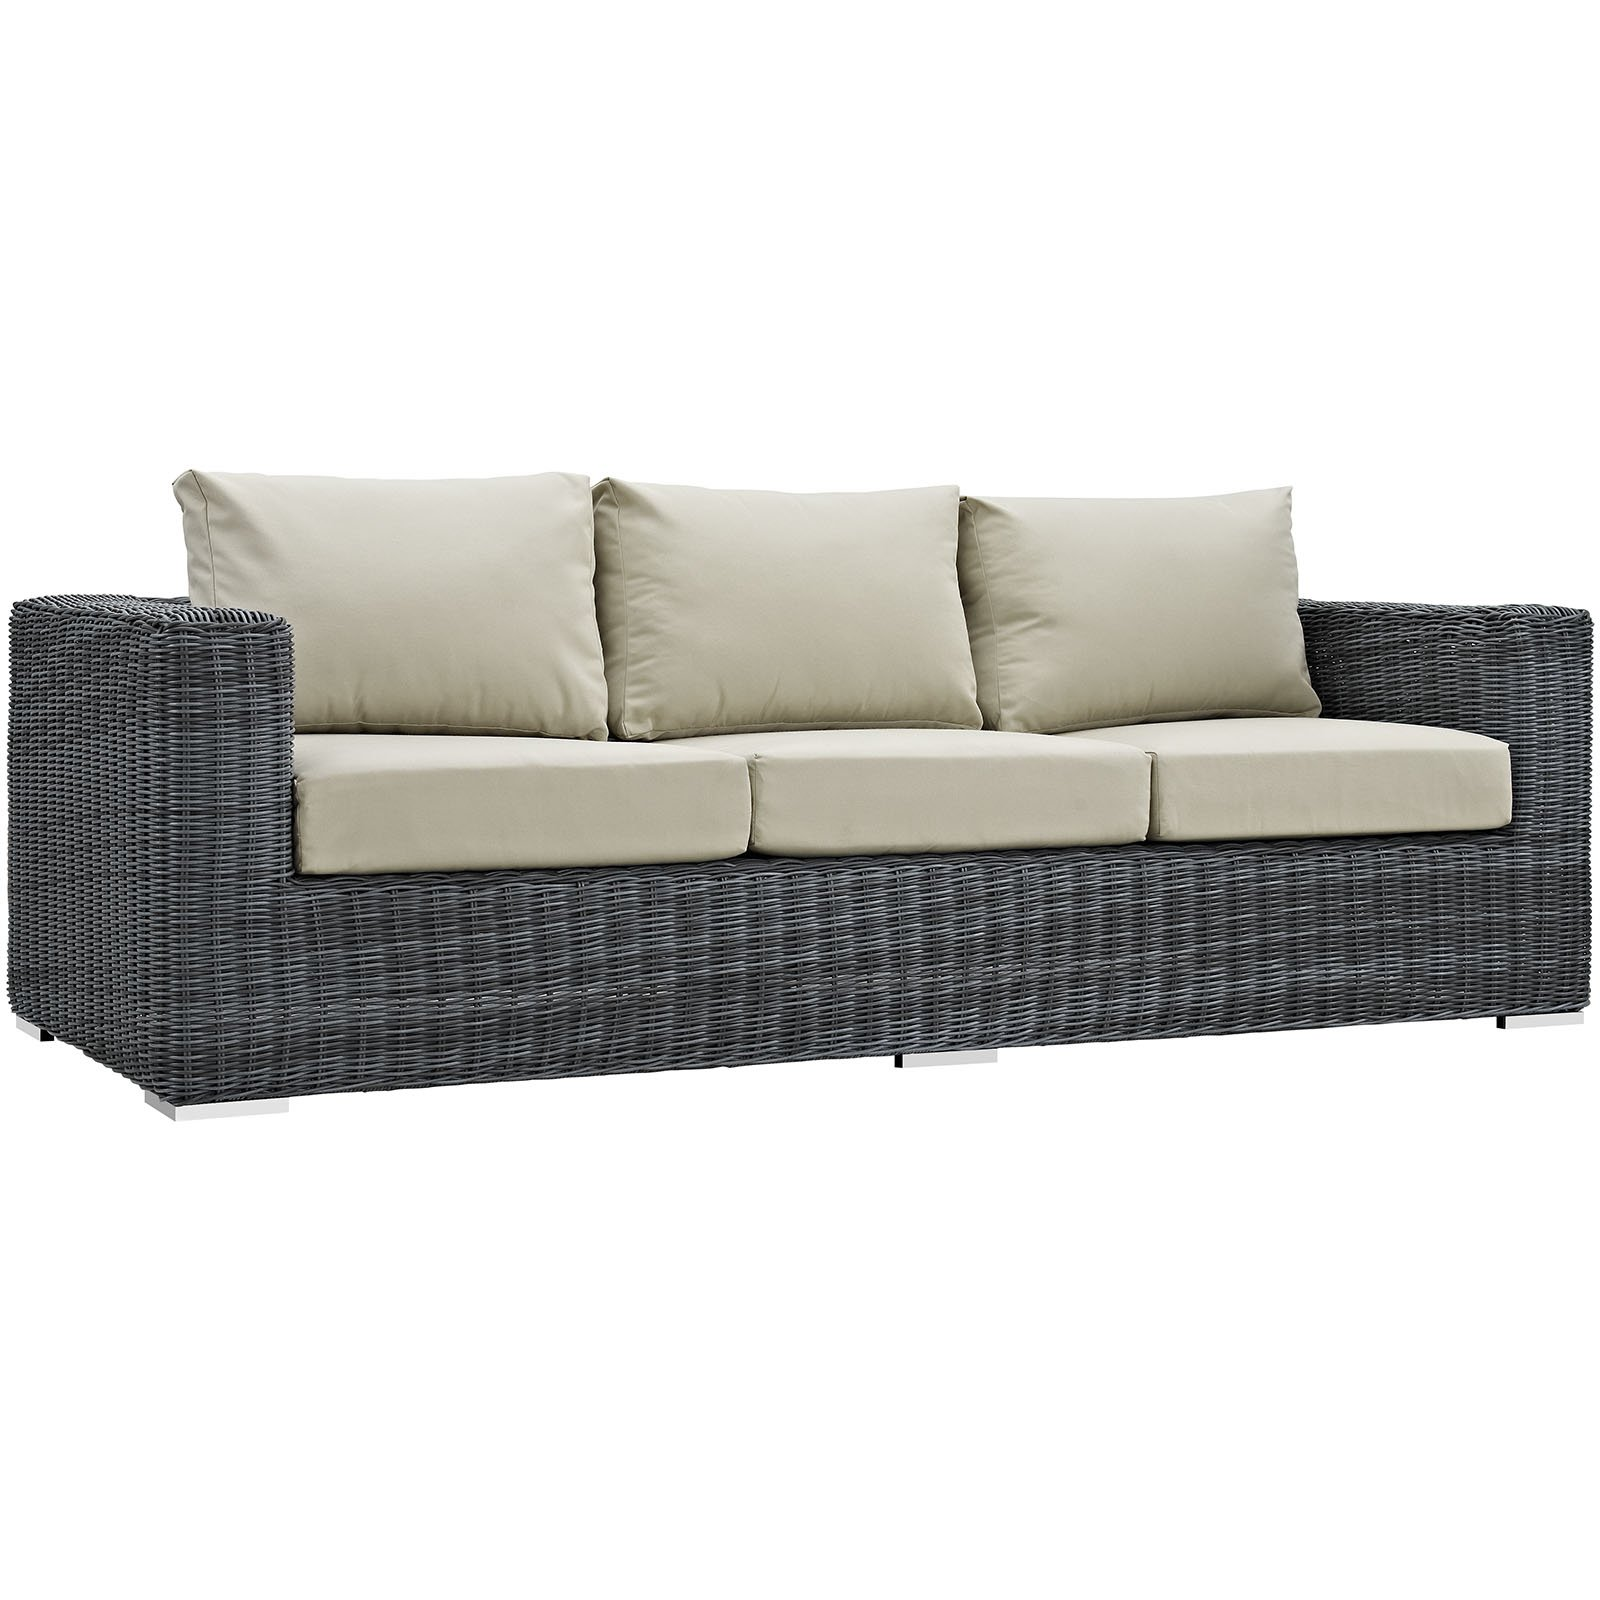 Modway Summon Outdoor Patio Sunbrella Sofa, Multiple Colors